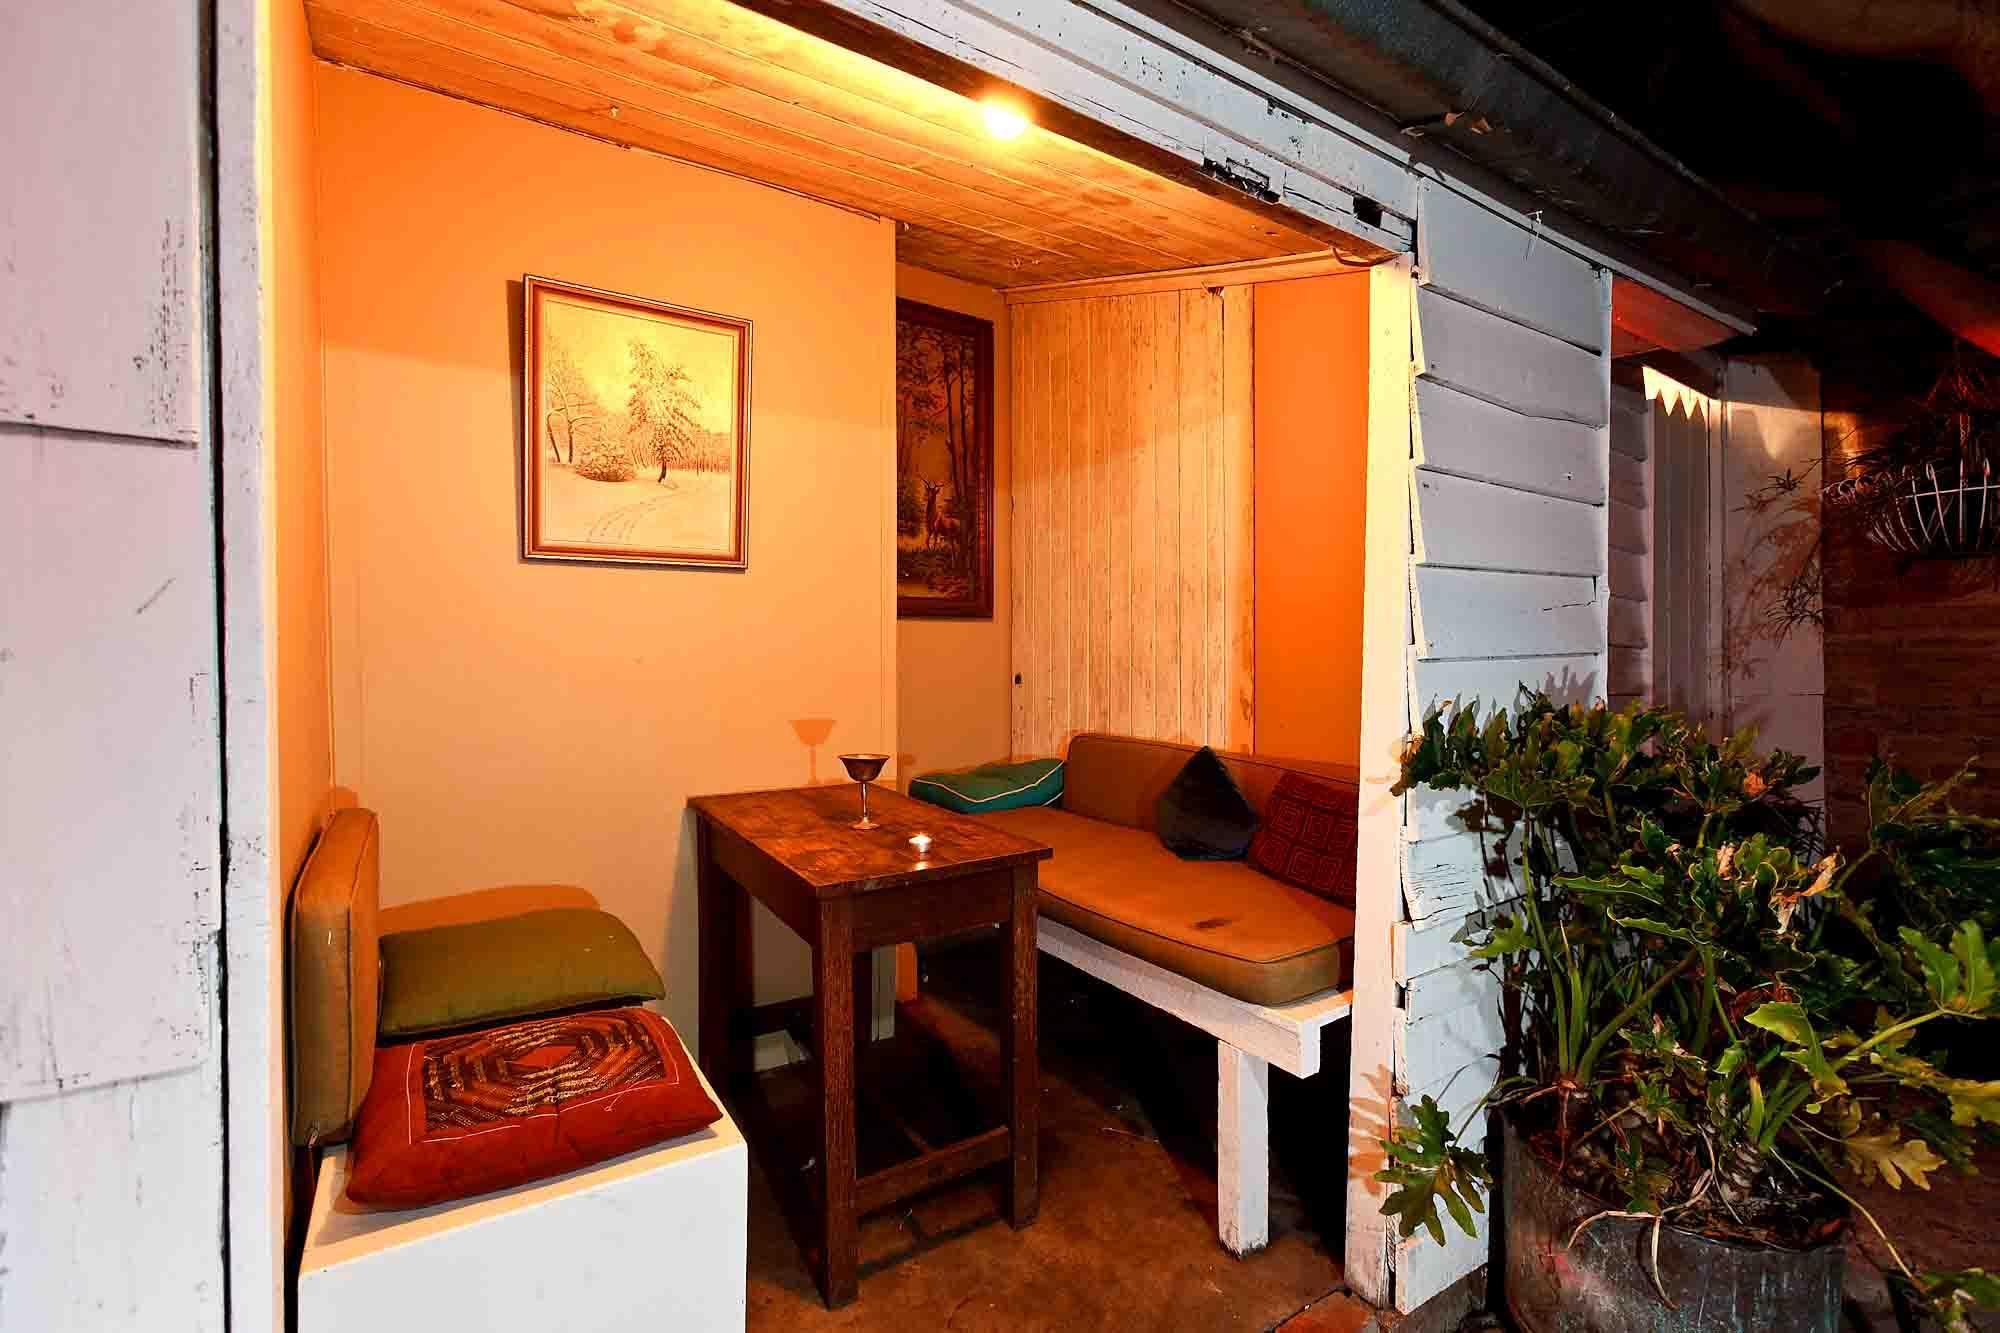 Acoustic Cafe – Hire the Entire Venue!